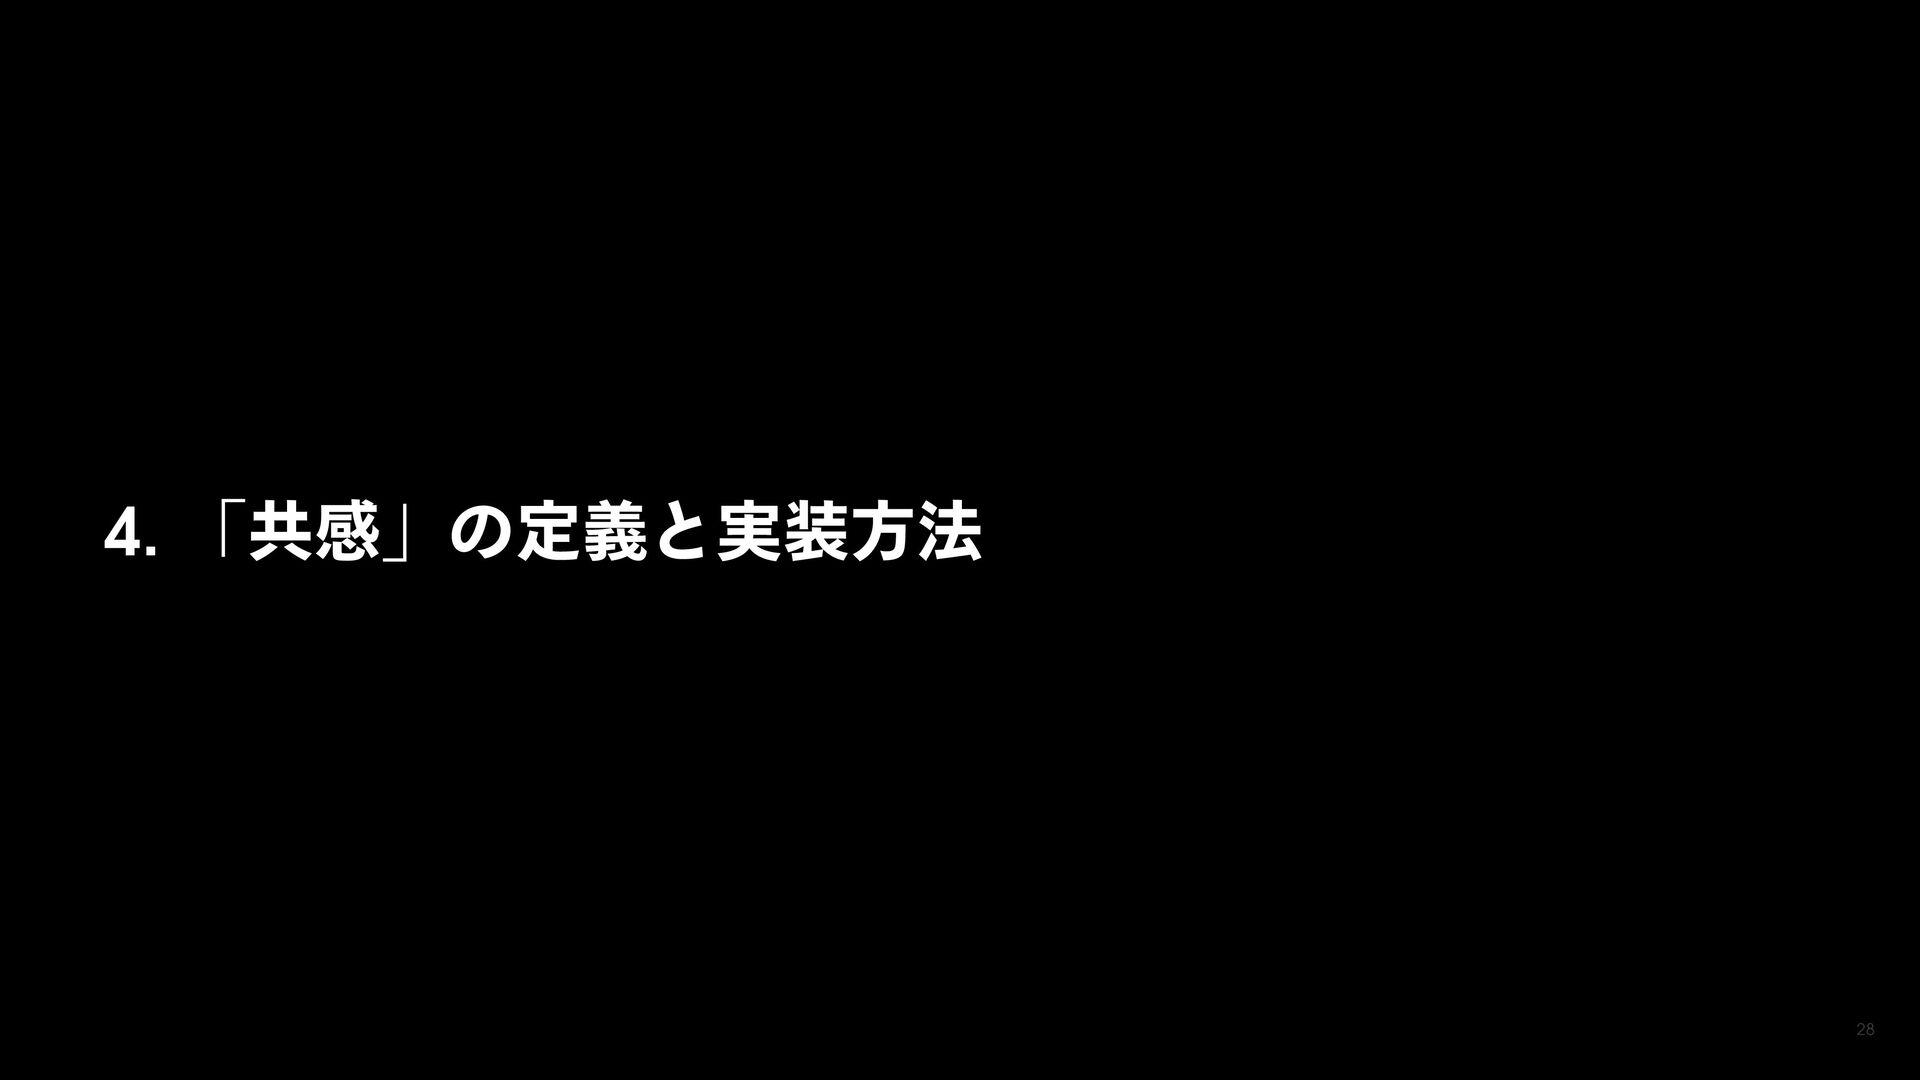 4. ʮڞײʯͷఆٛͱ࣮ํ๏